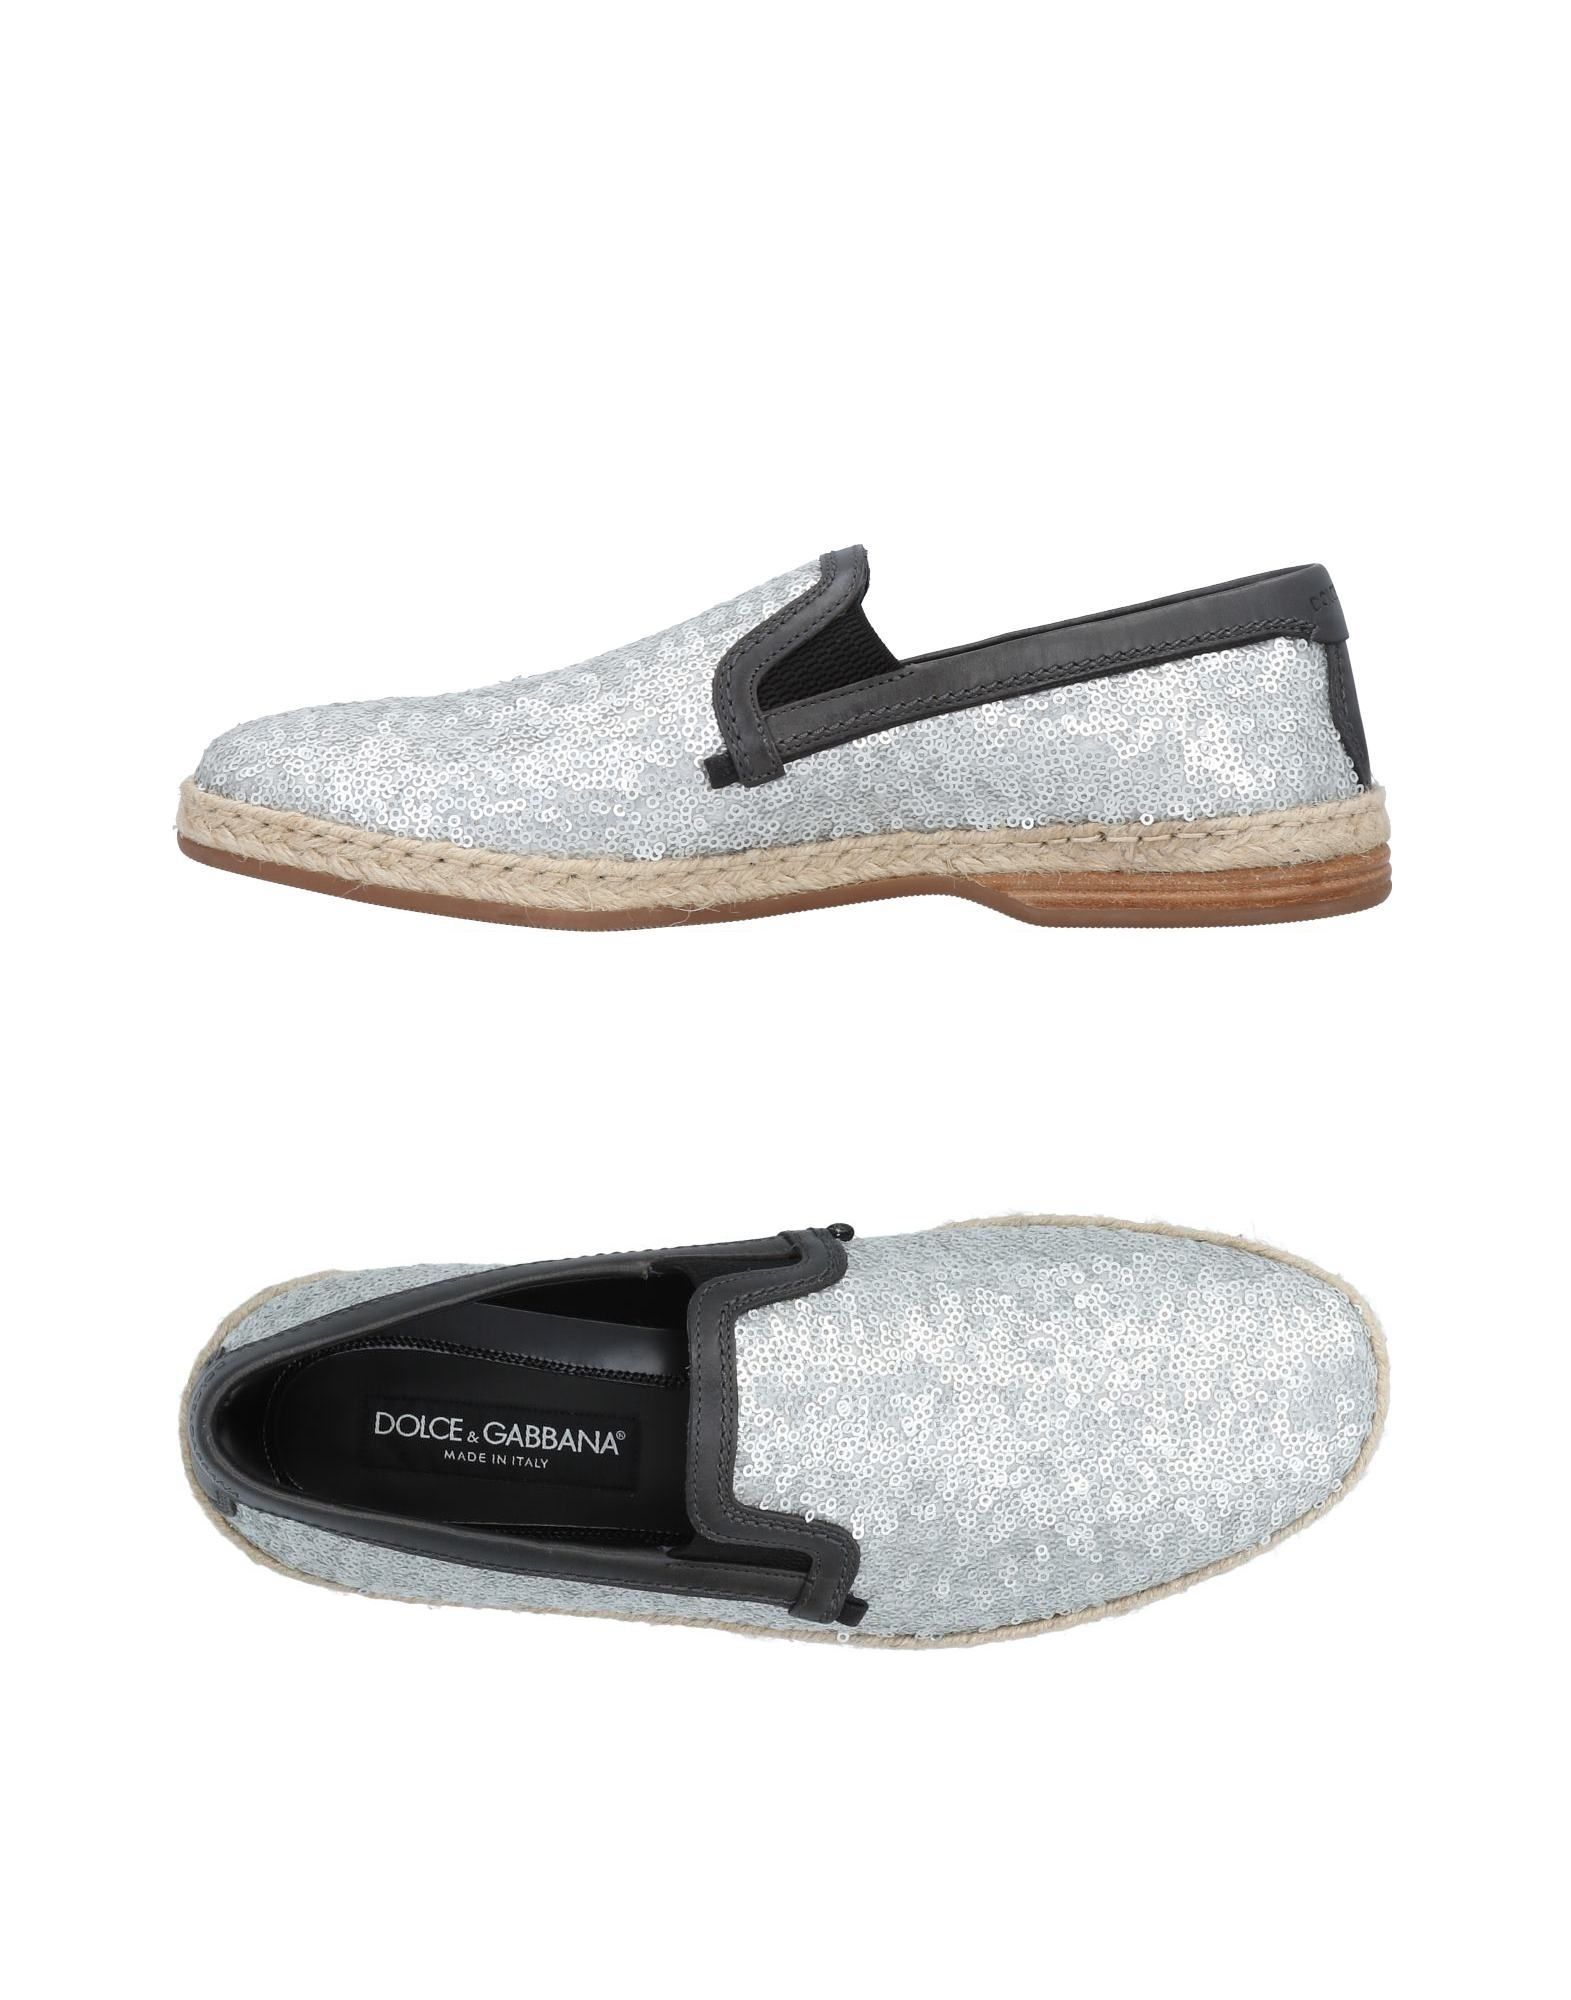 Dolce & Gabbana Sneakers Herren  11488636JM Gute Qualität beliebte Schuhe